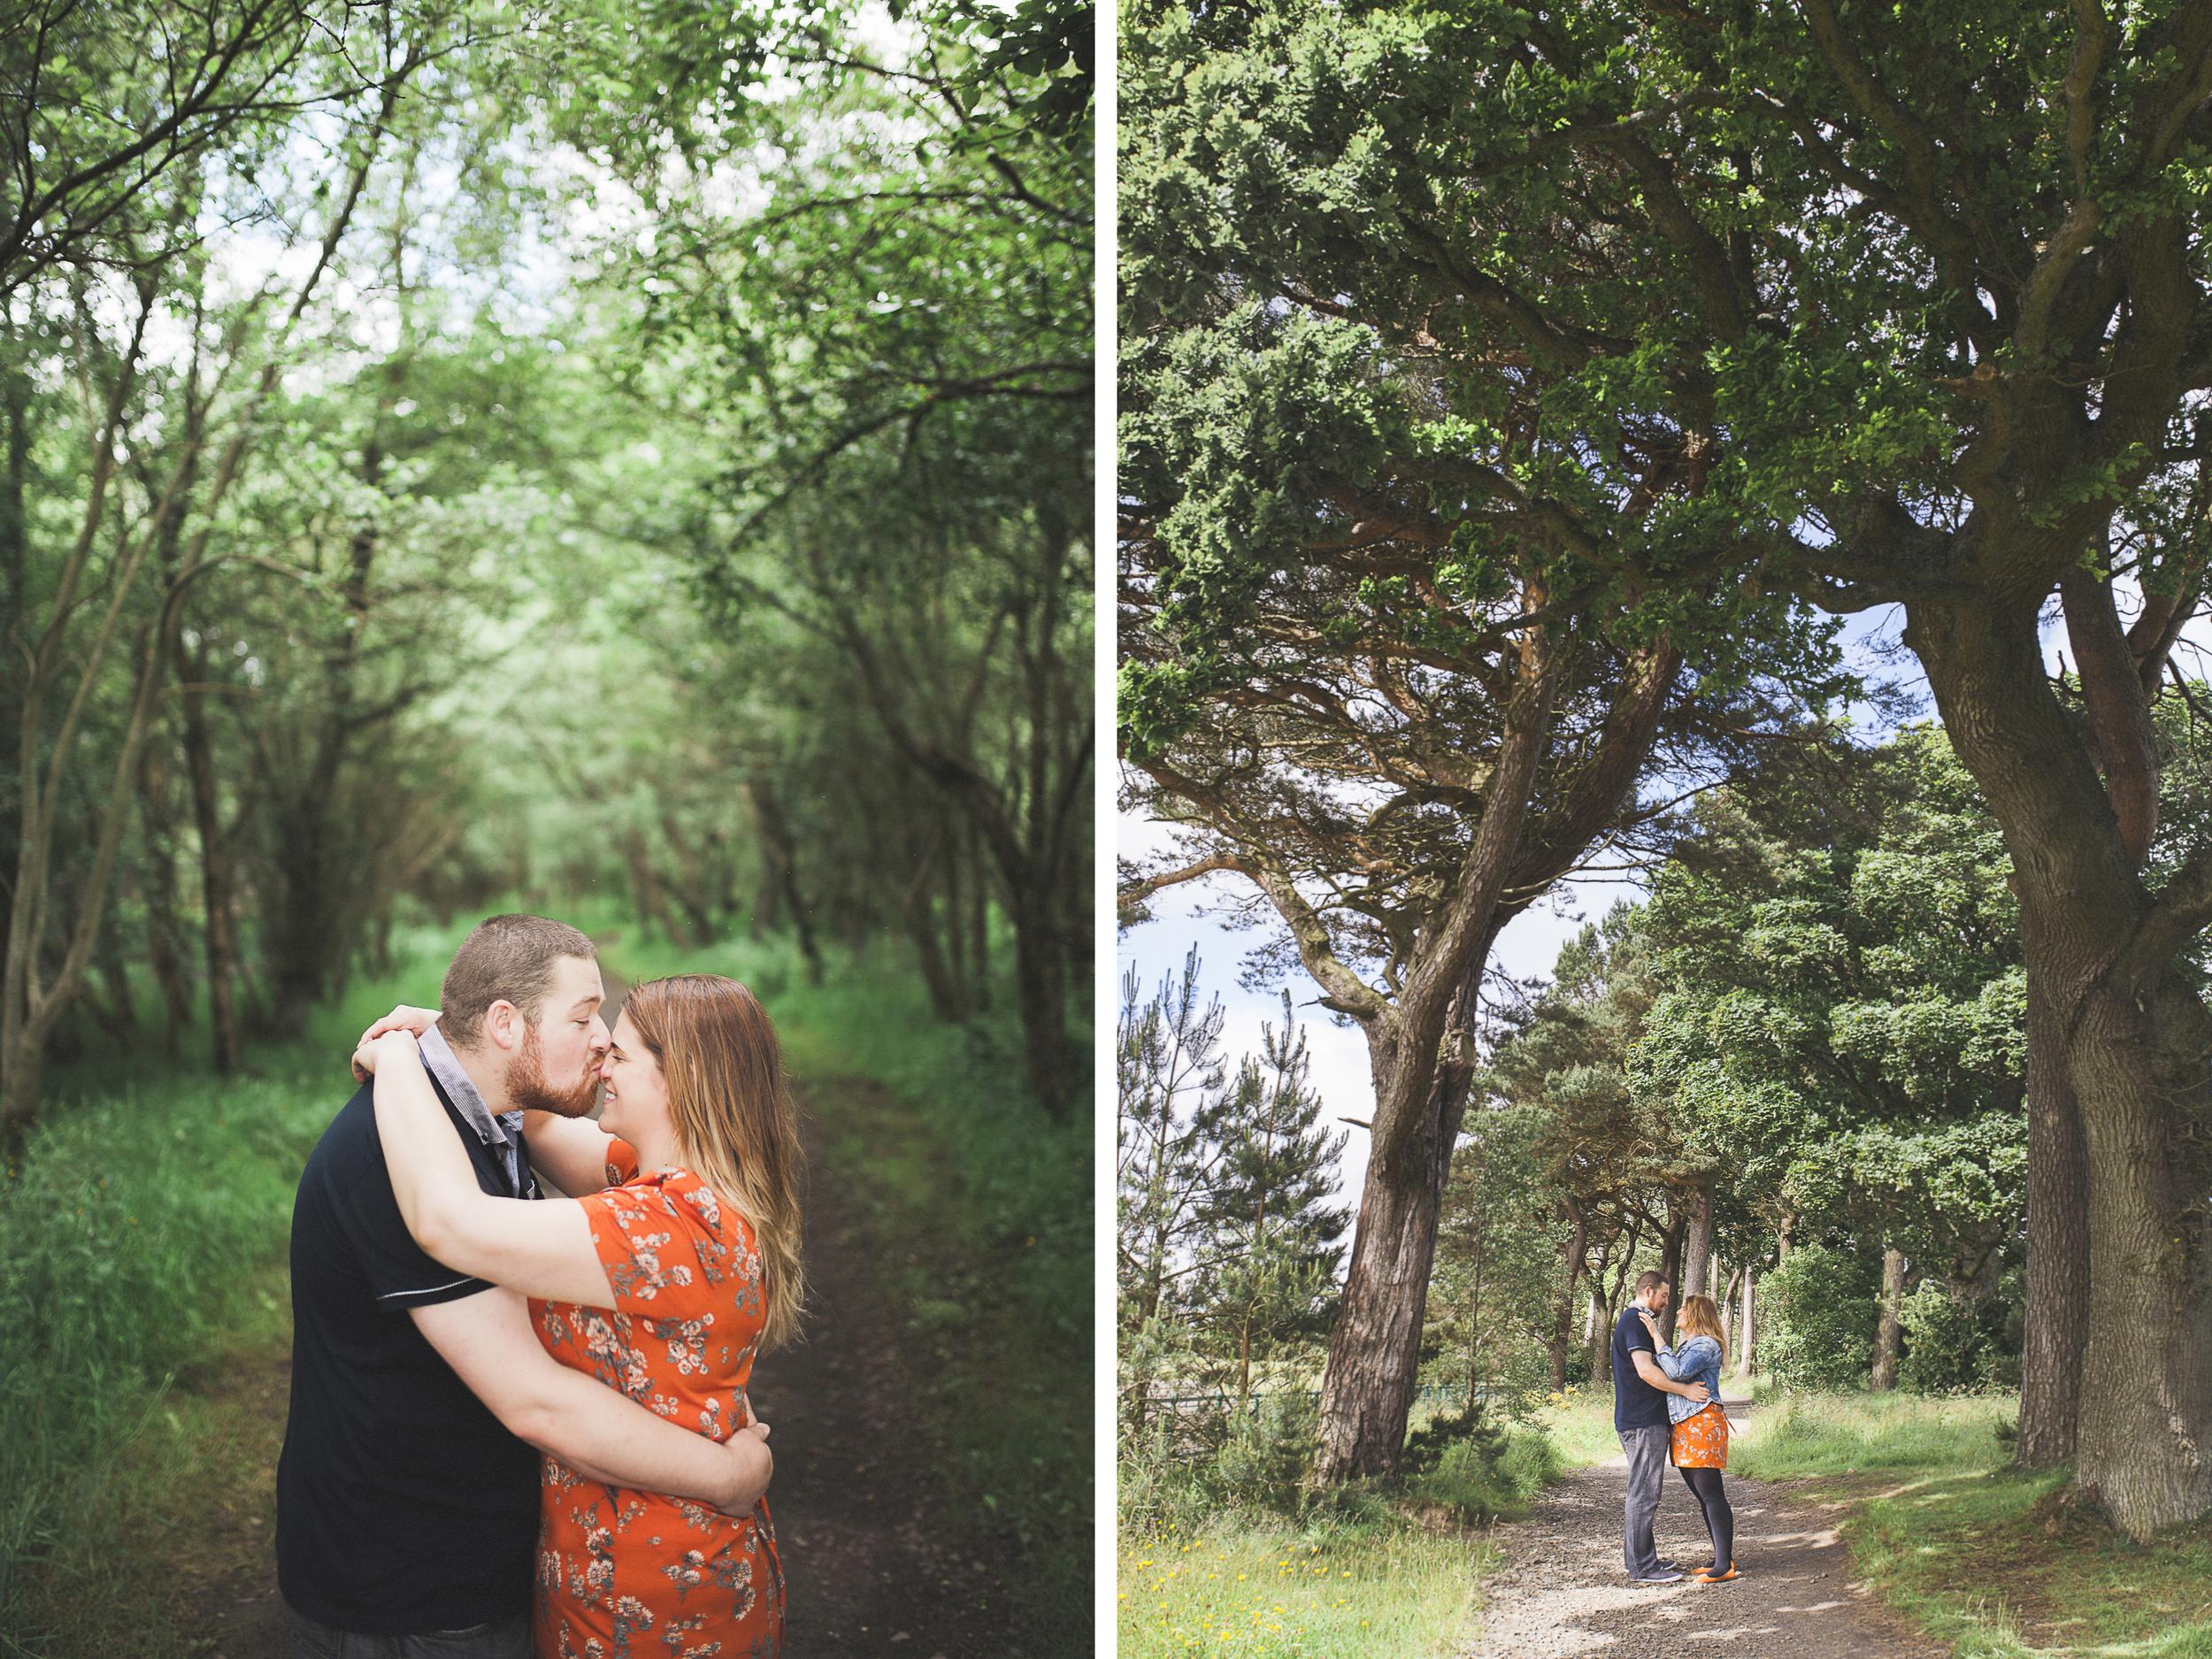 wedding-photographer-edinburgh-scotland-engagement-elopement-10.jpg